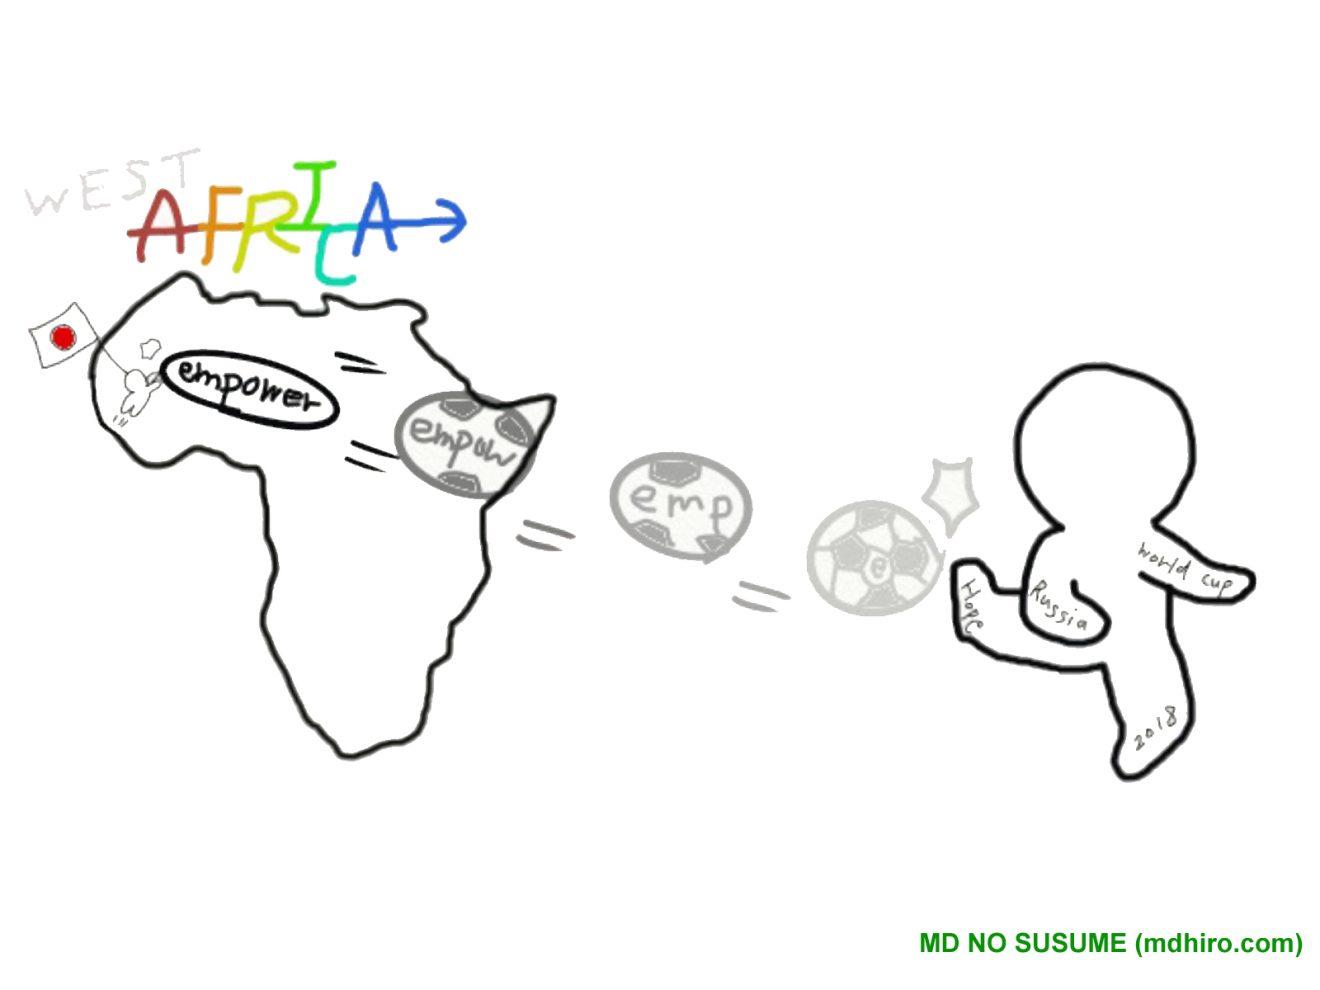 Mauritania 6 Final 20 Things I Learned From Mauritania